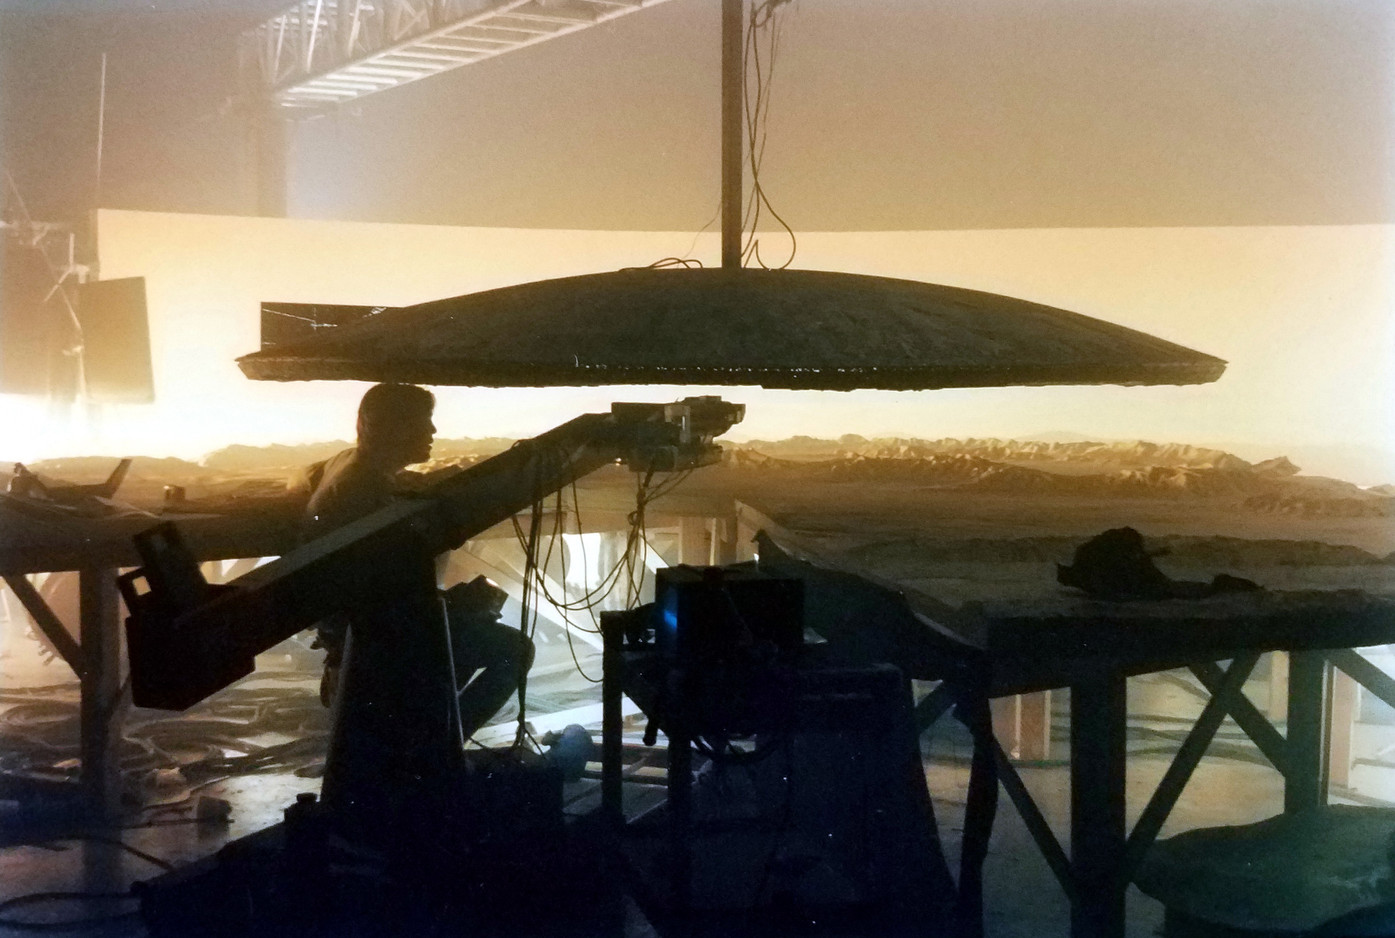 6-ft city destroyer hovers over desert tabletop miniature